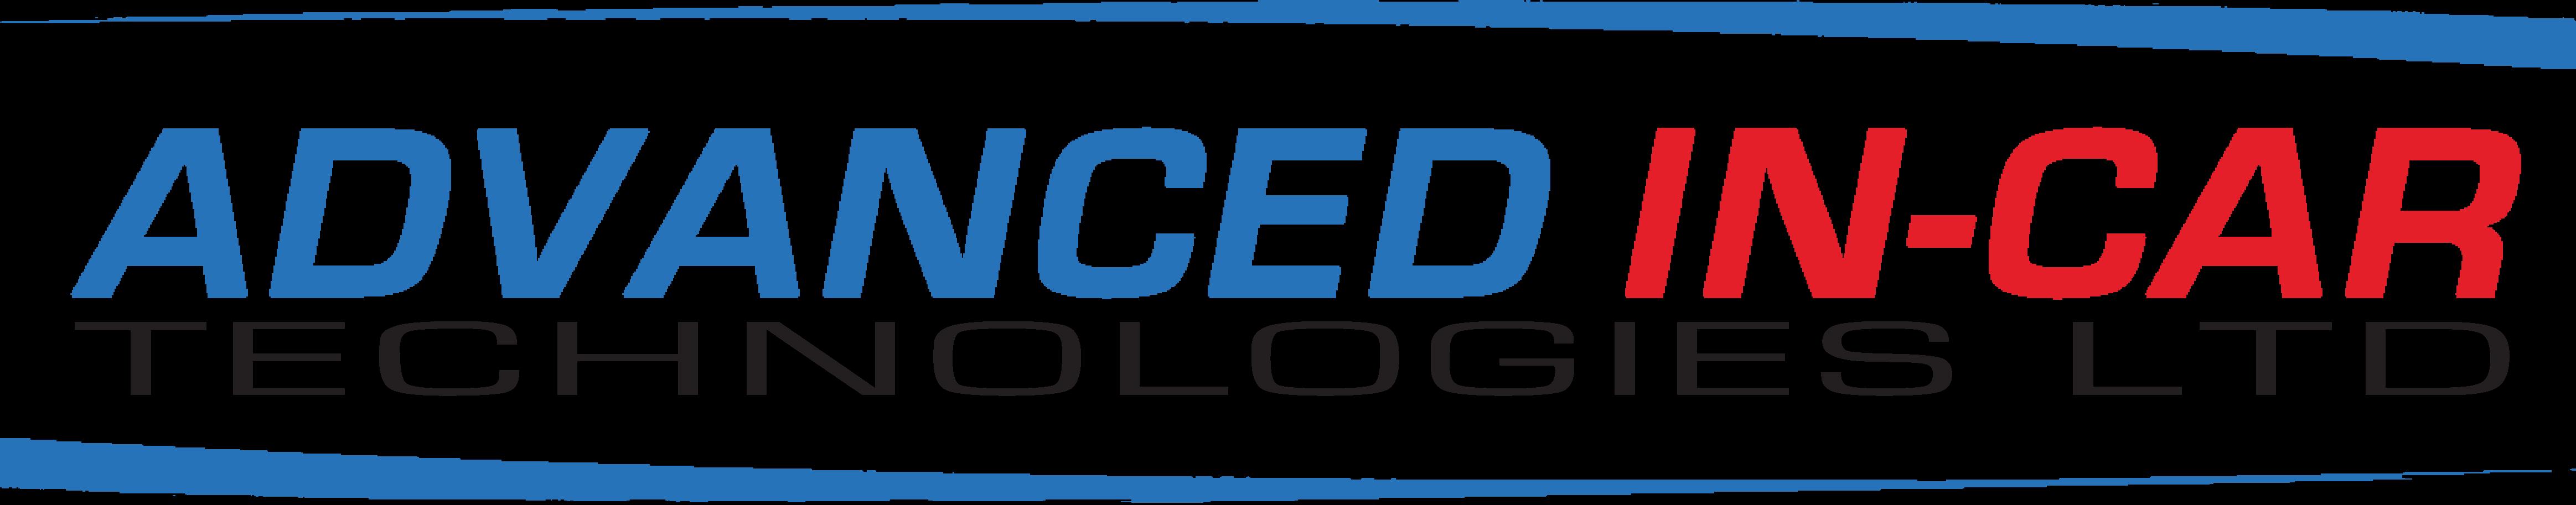 Advanced In-Car Technologies logo